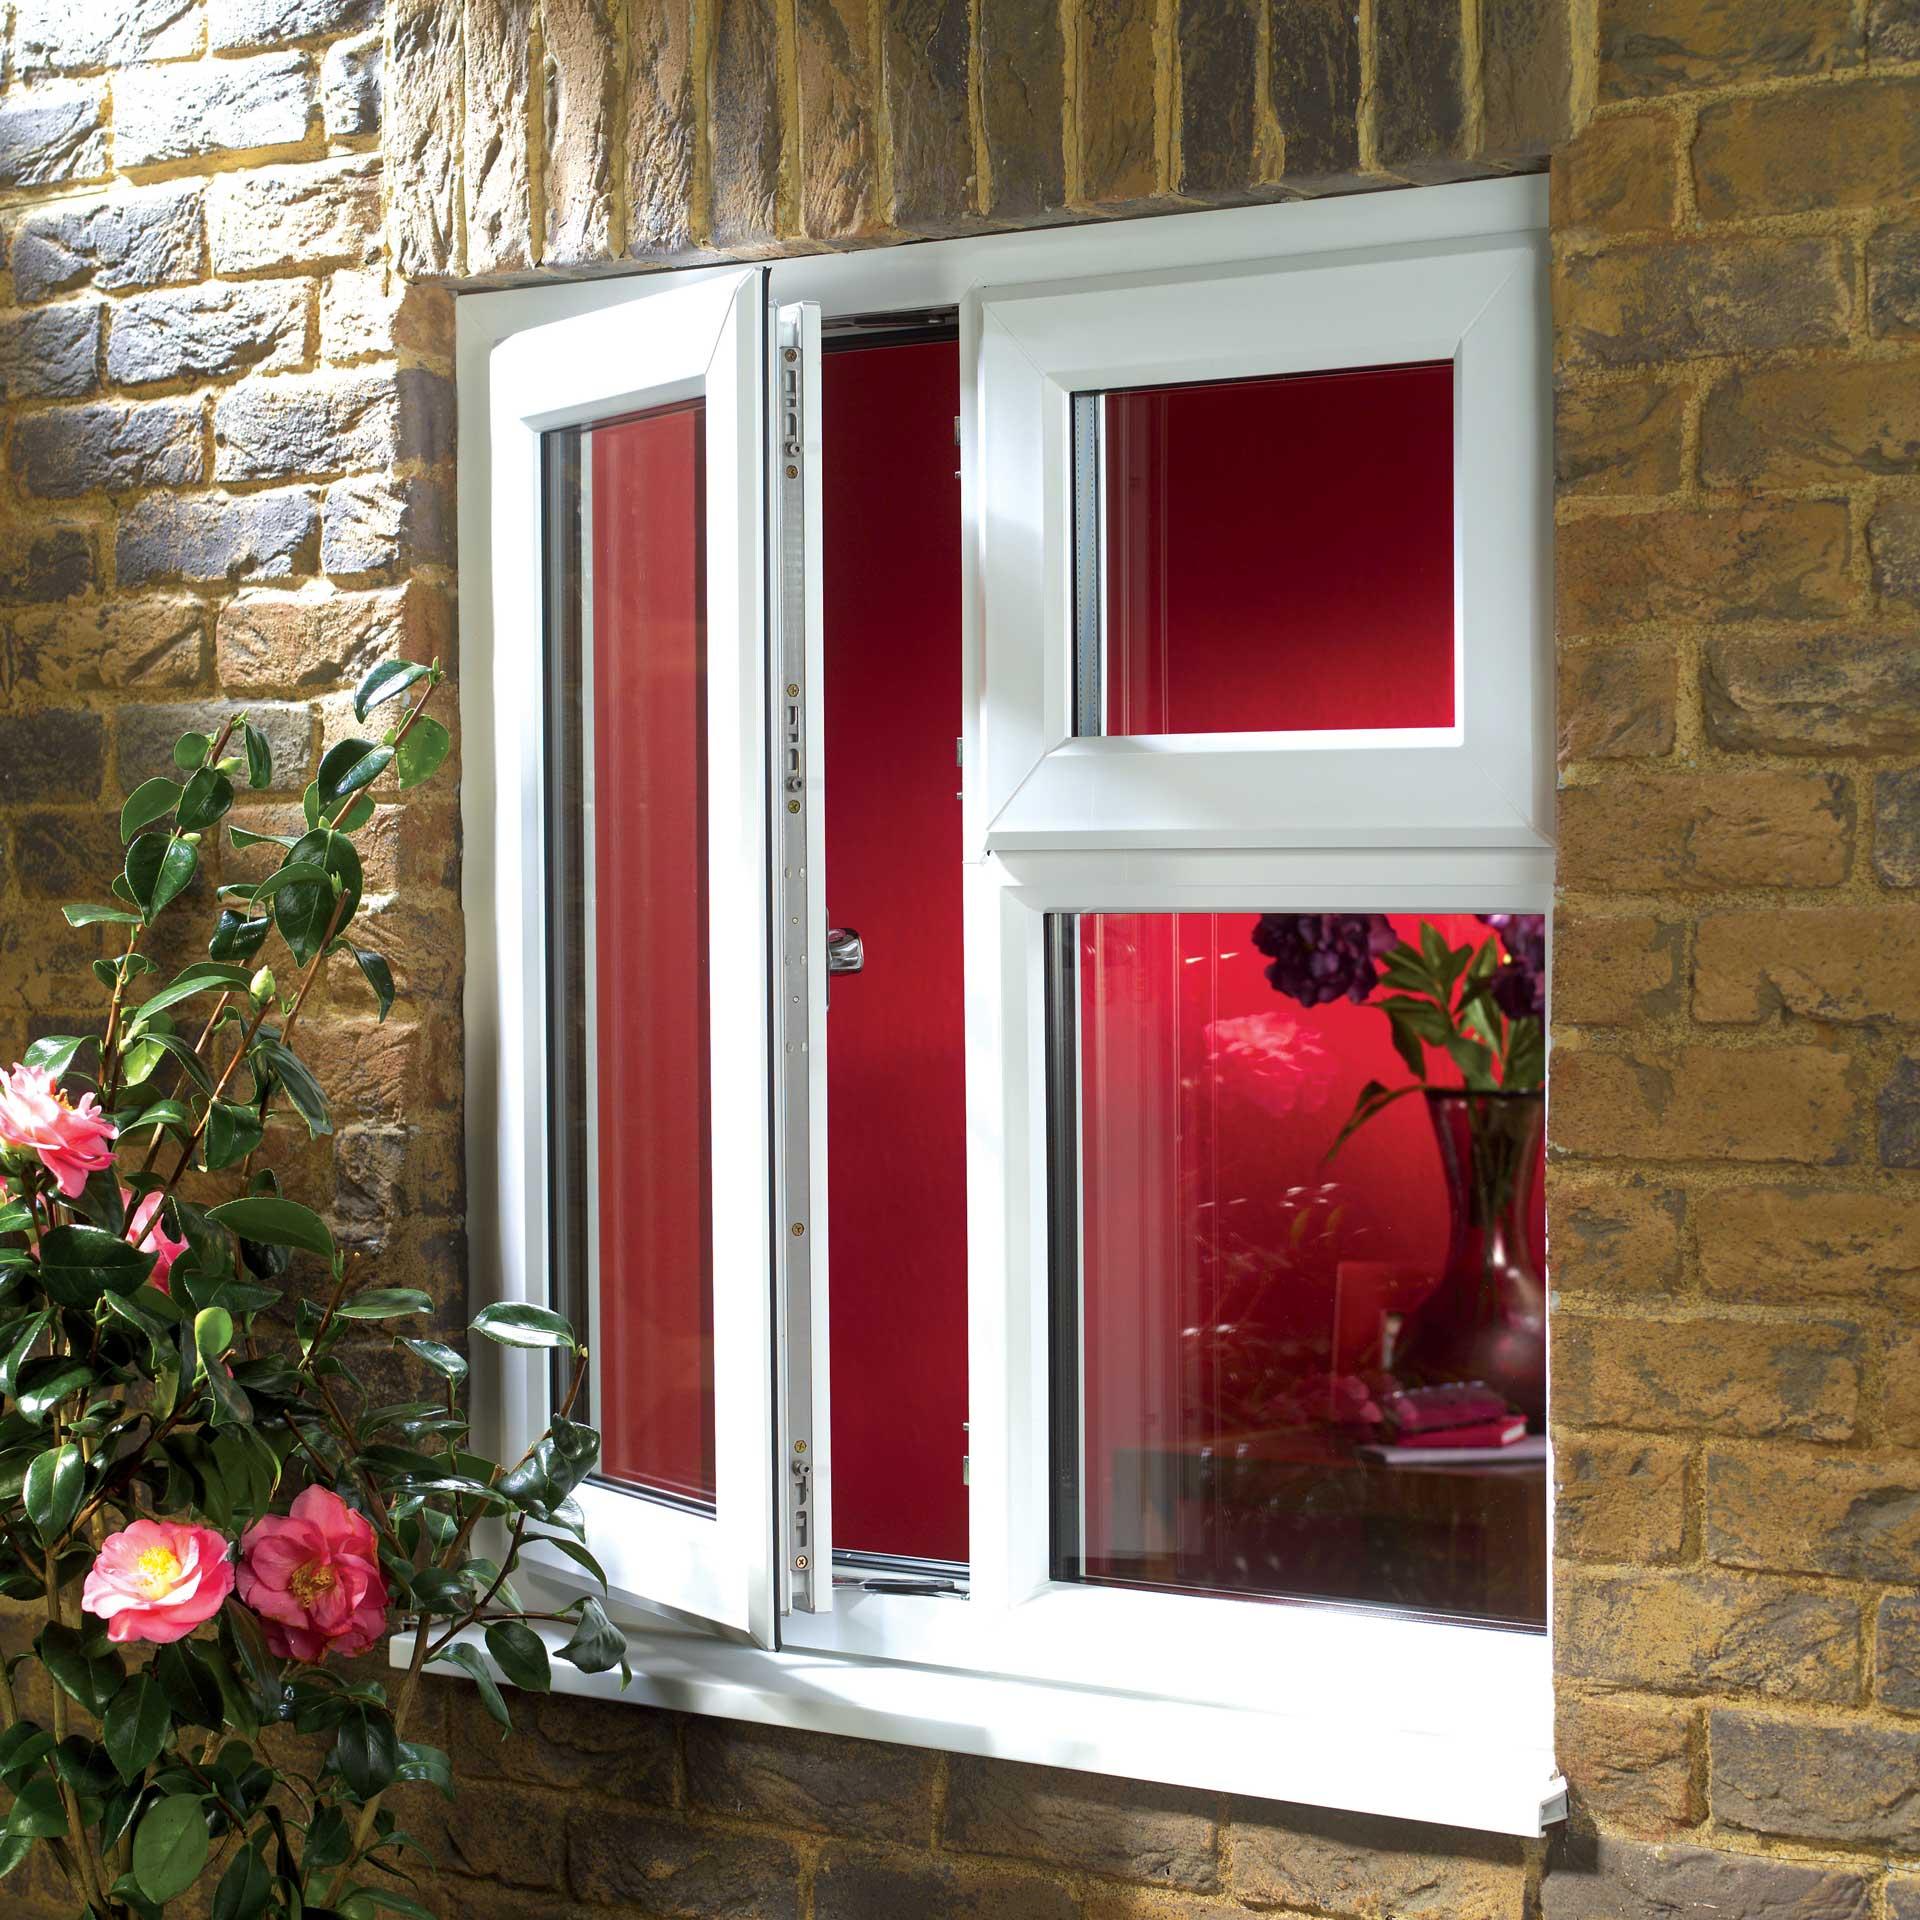 Double glazing windows Stratford upon avon